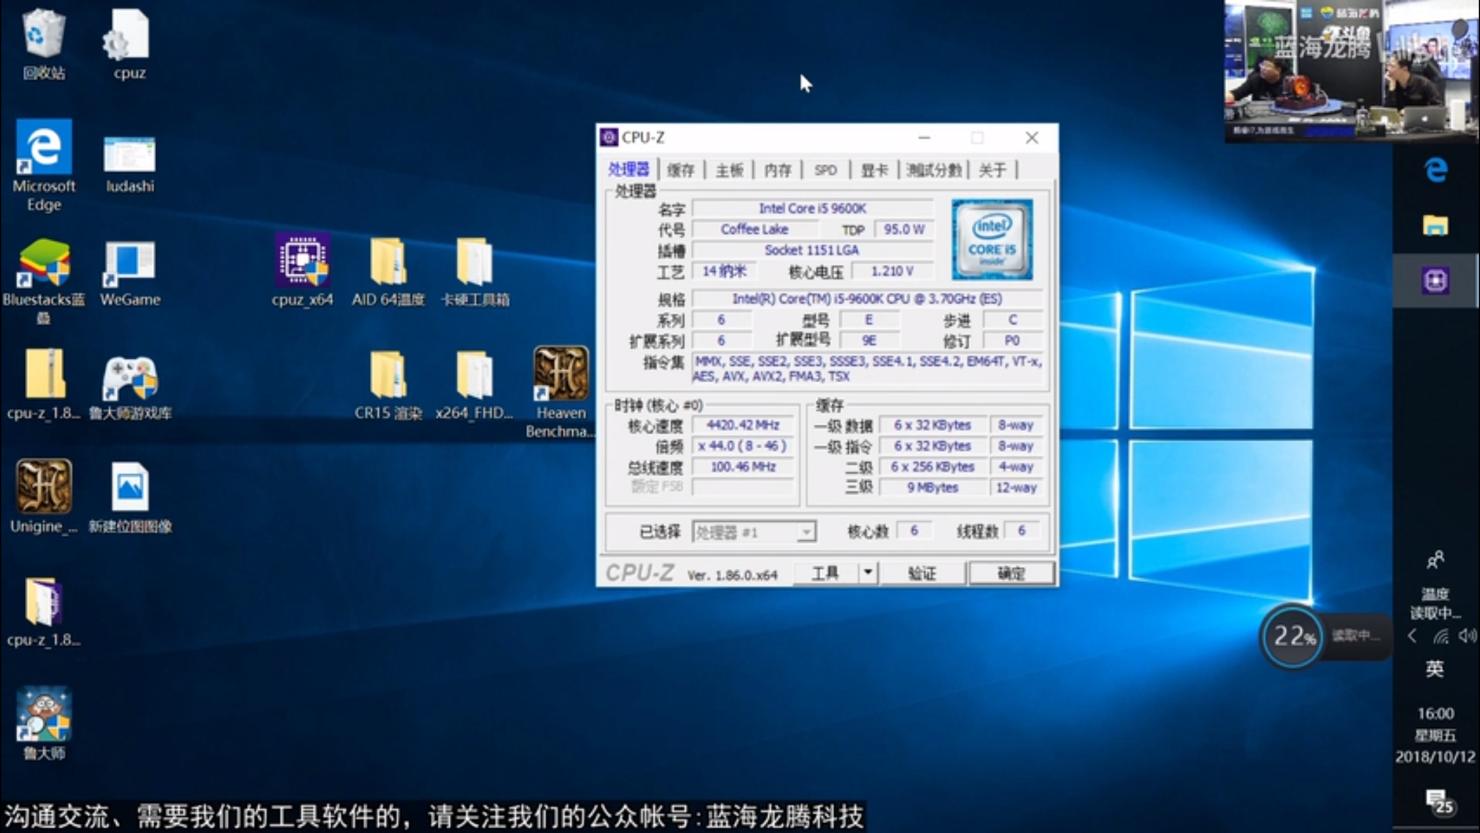 intel-core-i5-9600k-cpu-benchmarks_2